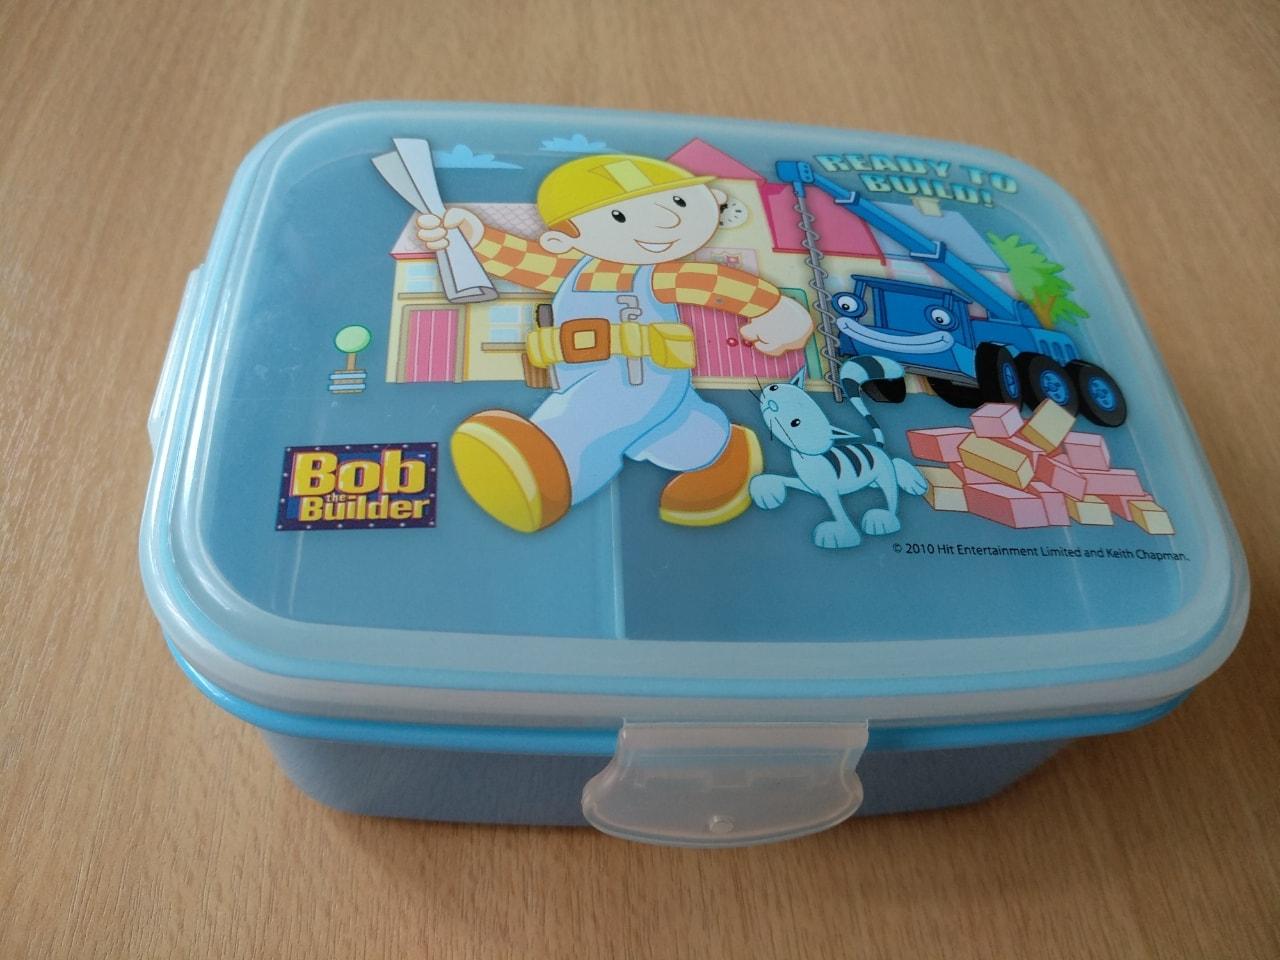 Bob the builder lunchbox